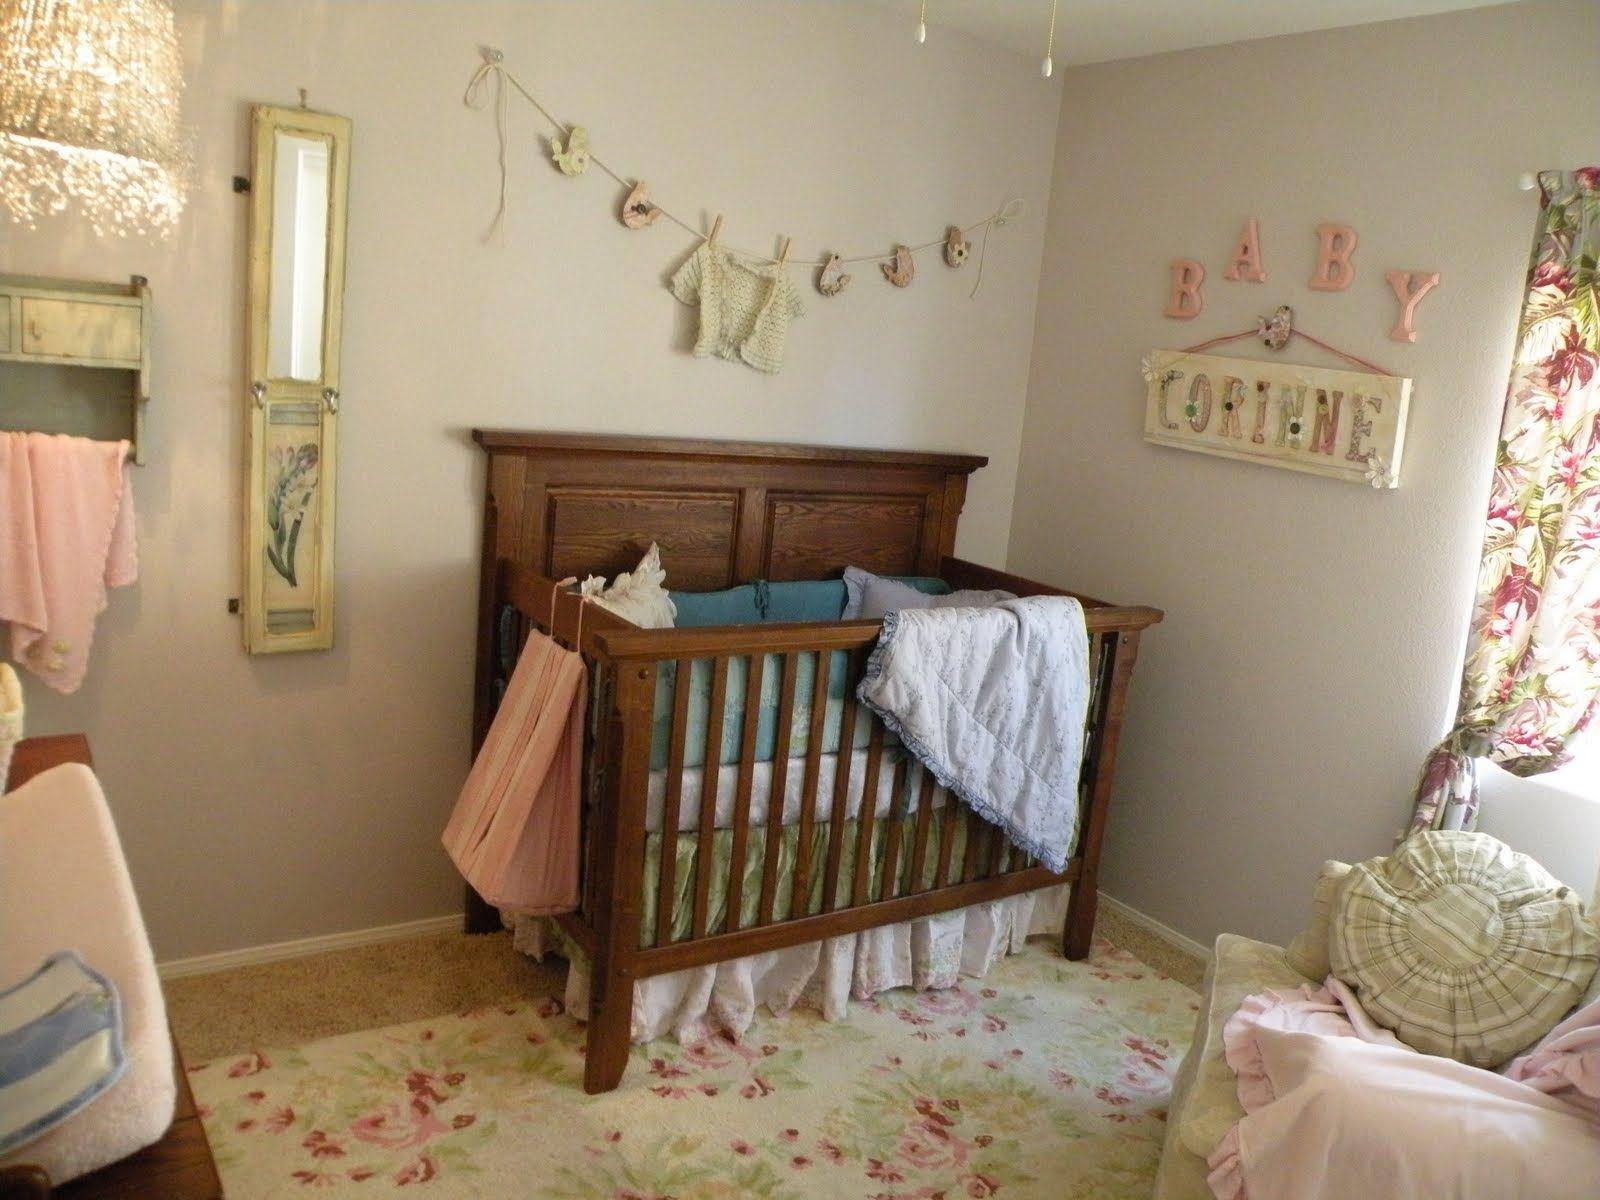 Baby girls bedroom decor - Baby Girls Bedroom Decor